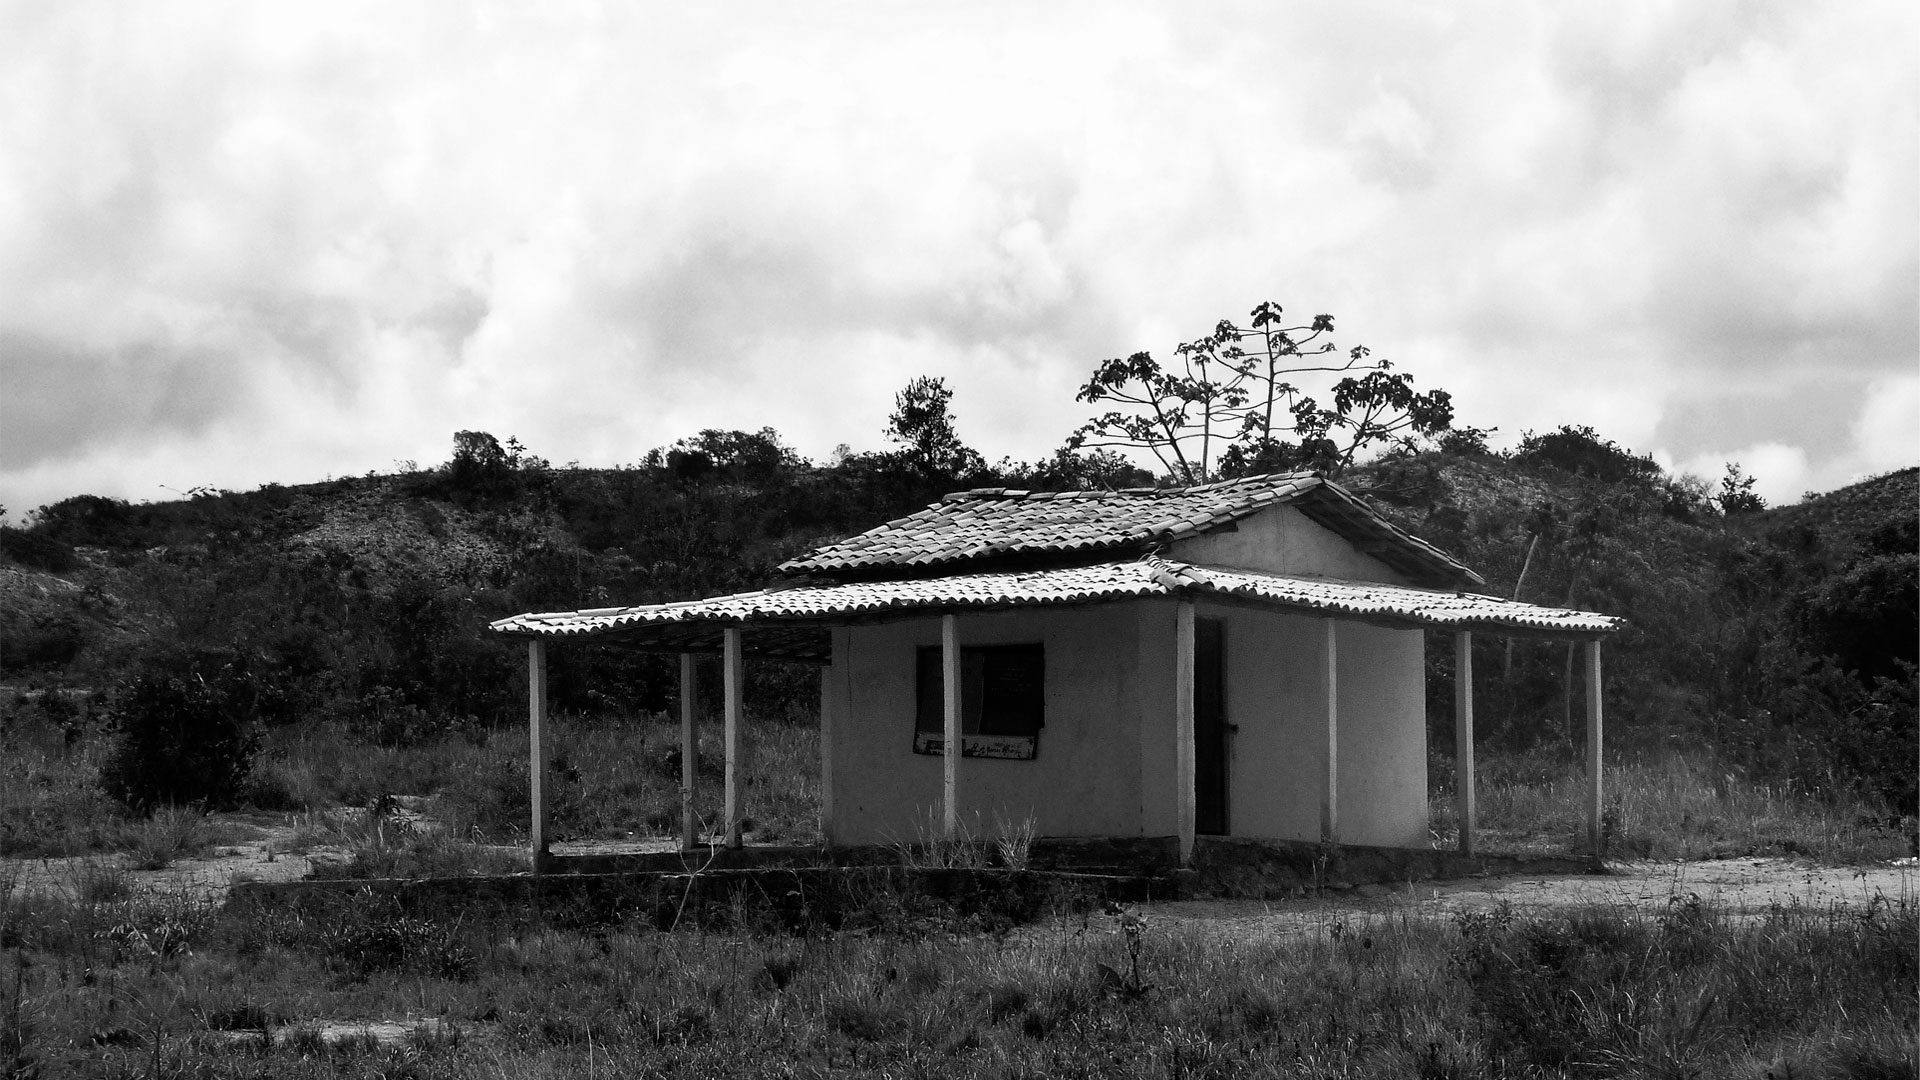 5.alba-avarandados-vernaculares